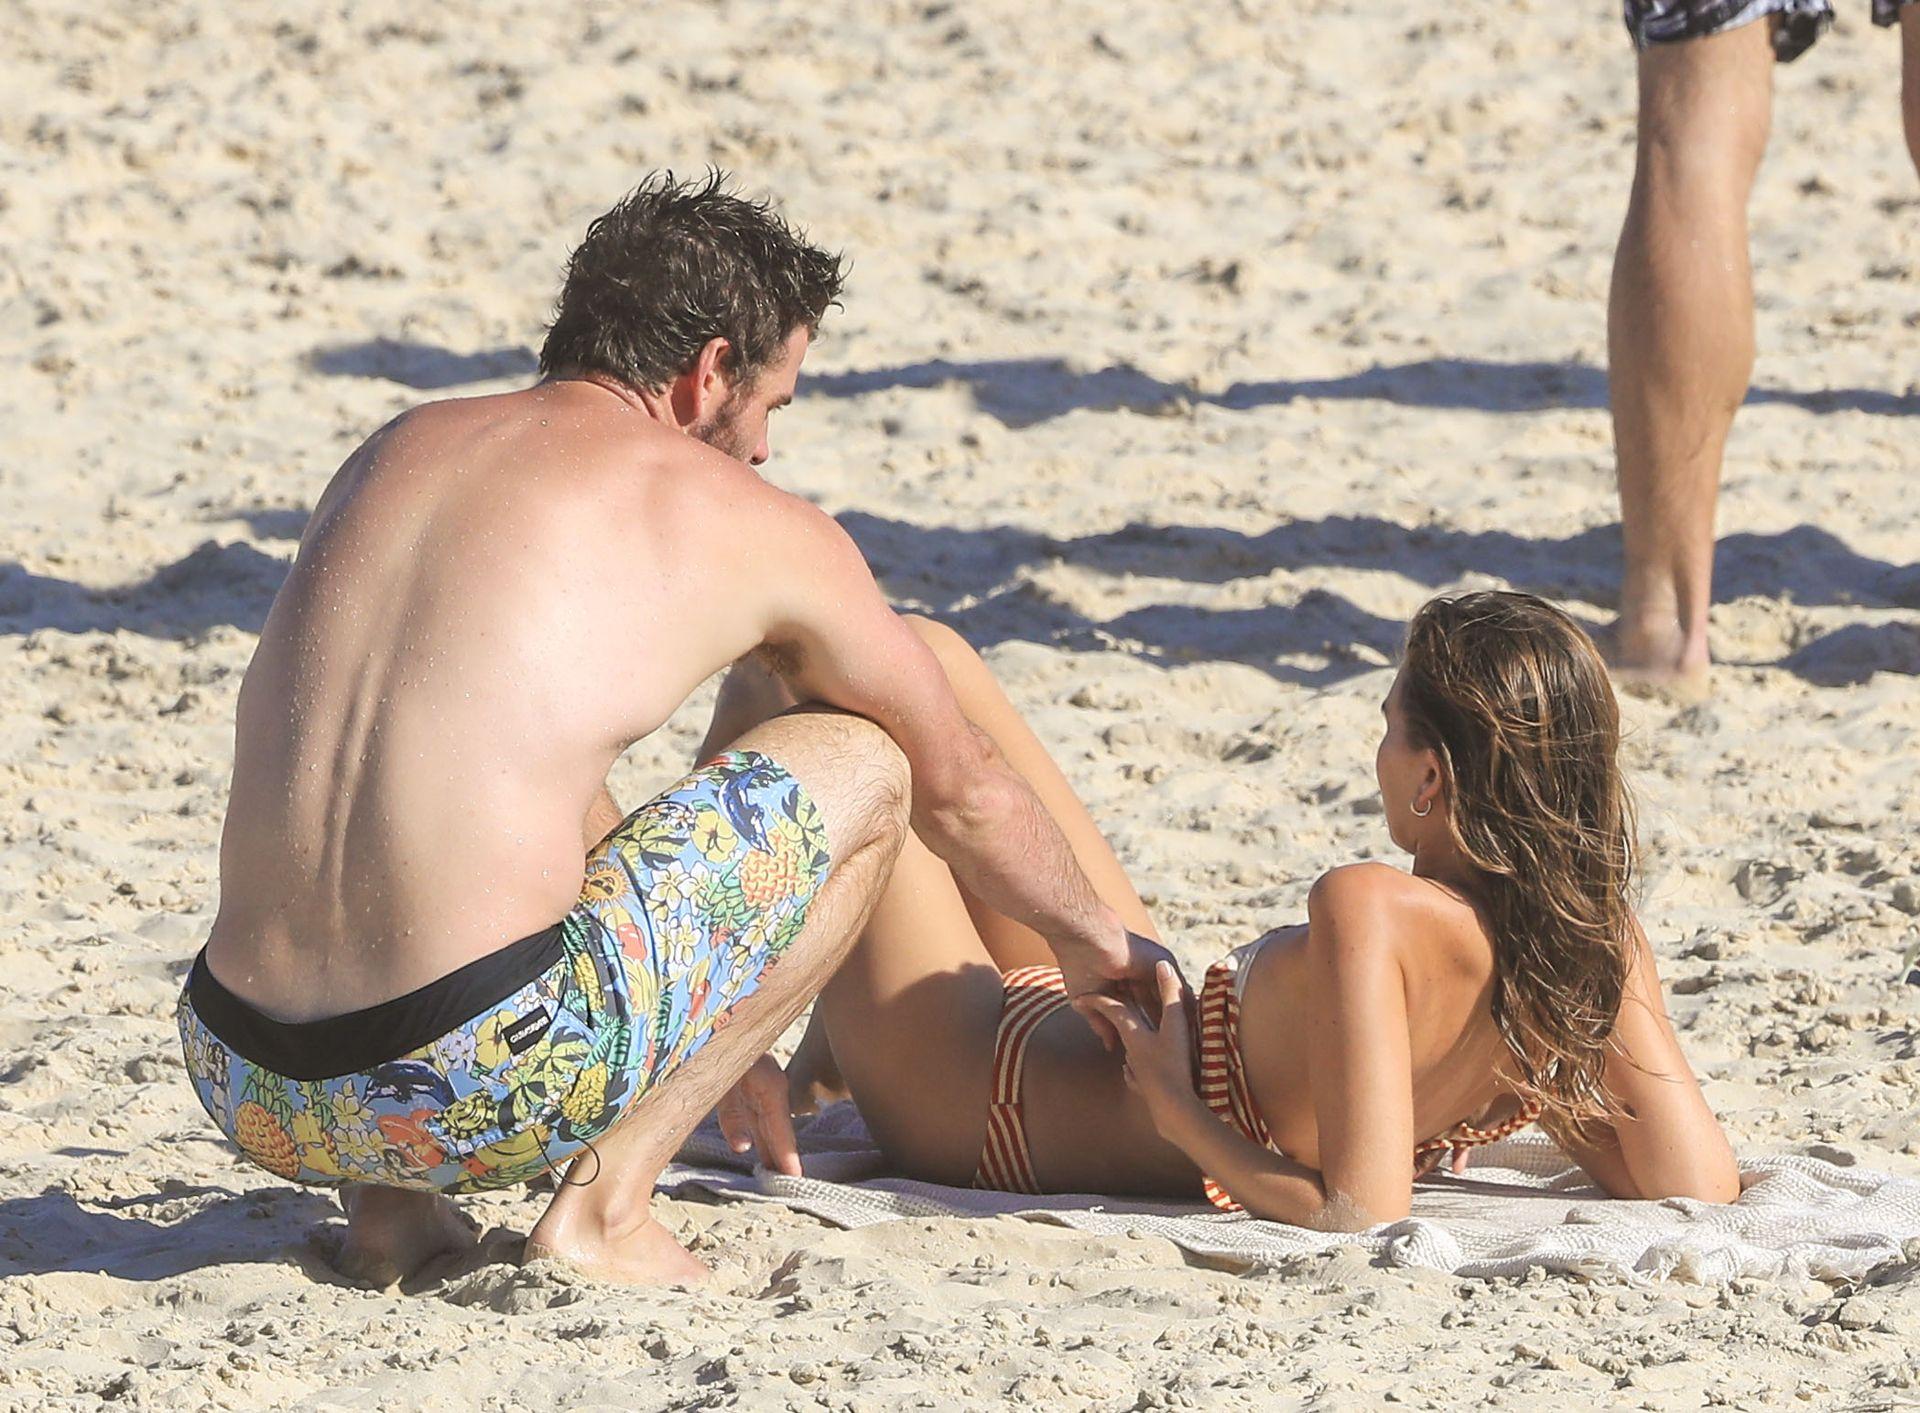 Gabriella Brooks Hot – Liam Hemsworth's New Girlfriend 0029